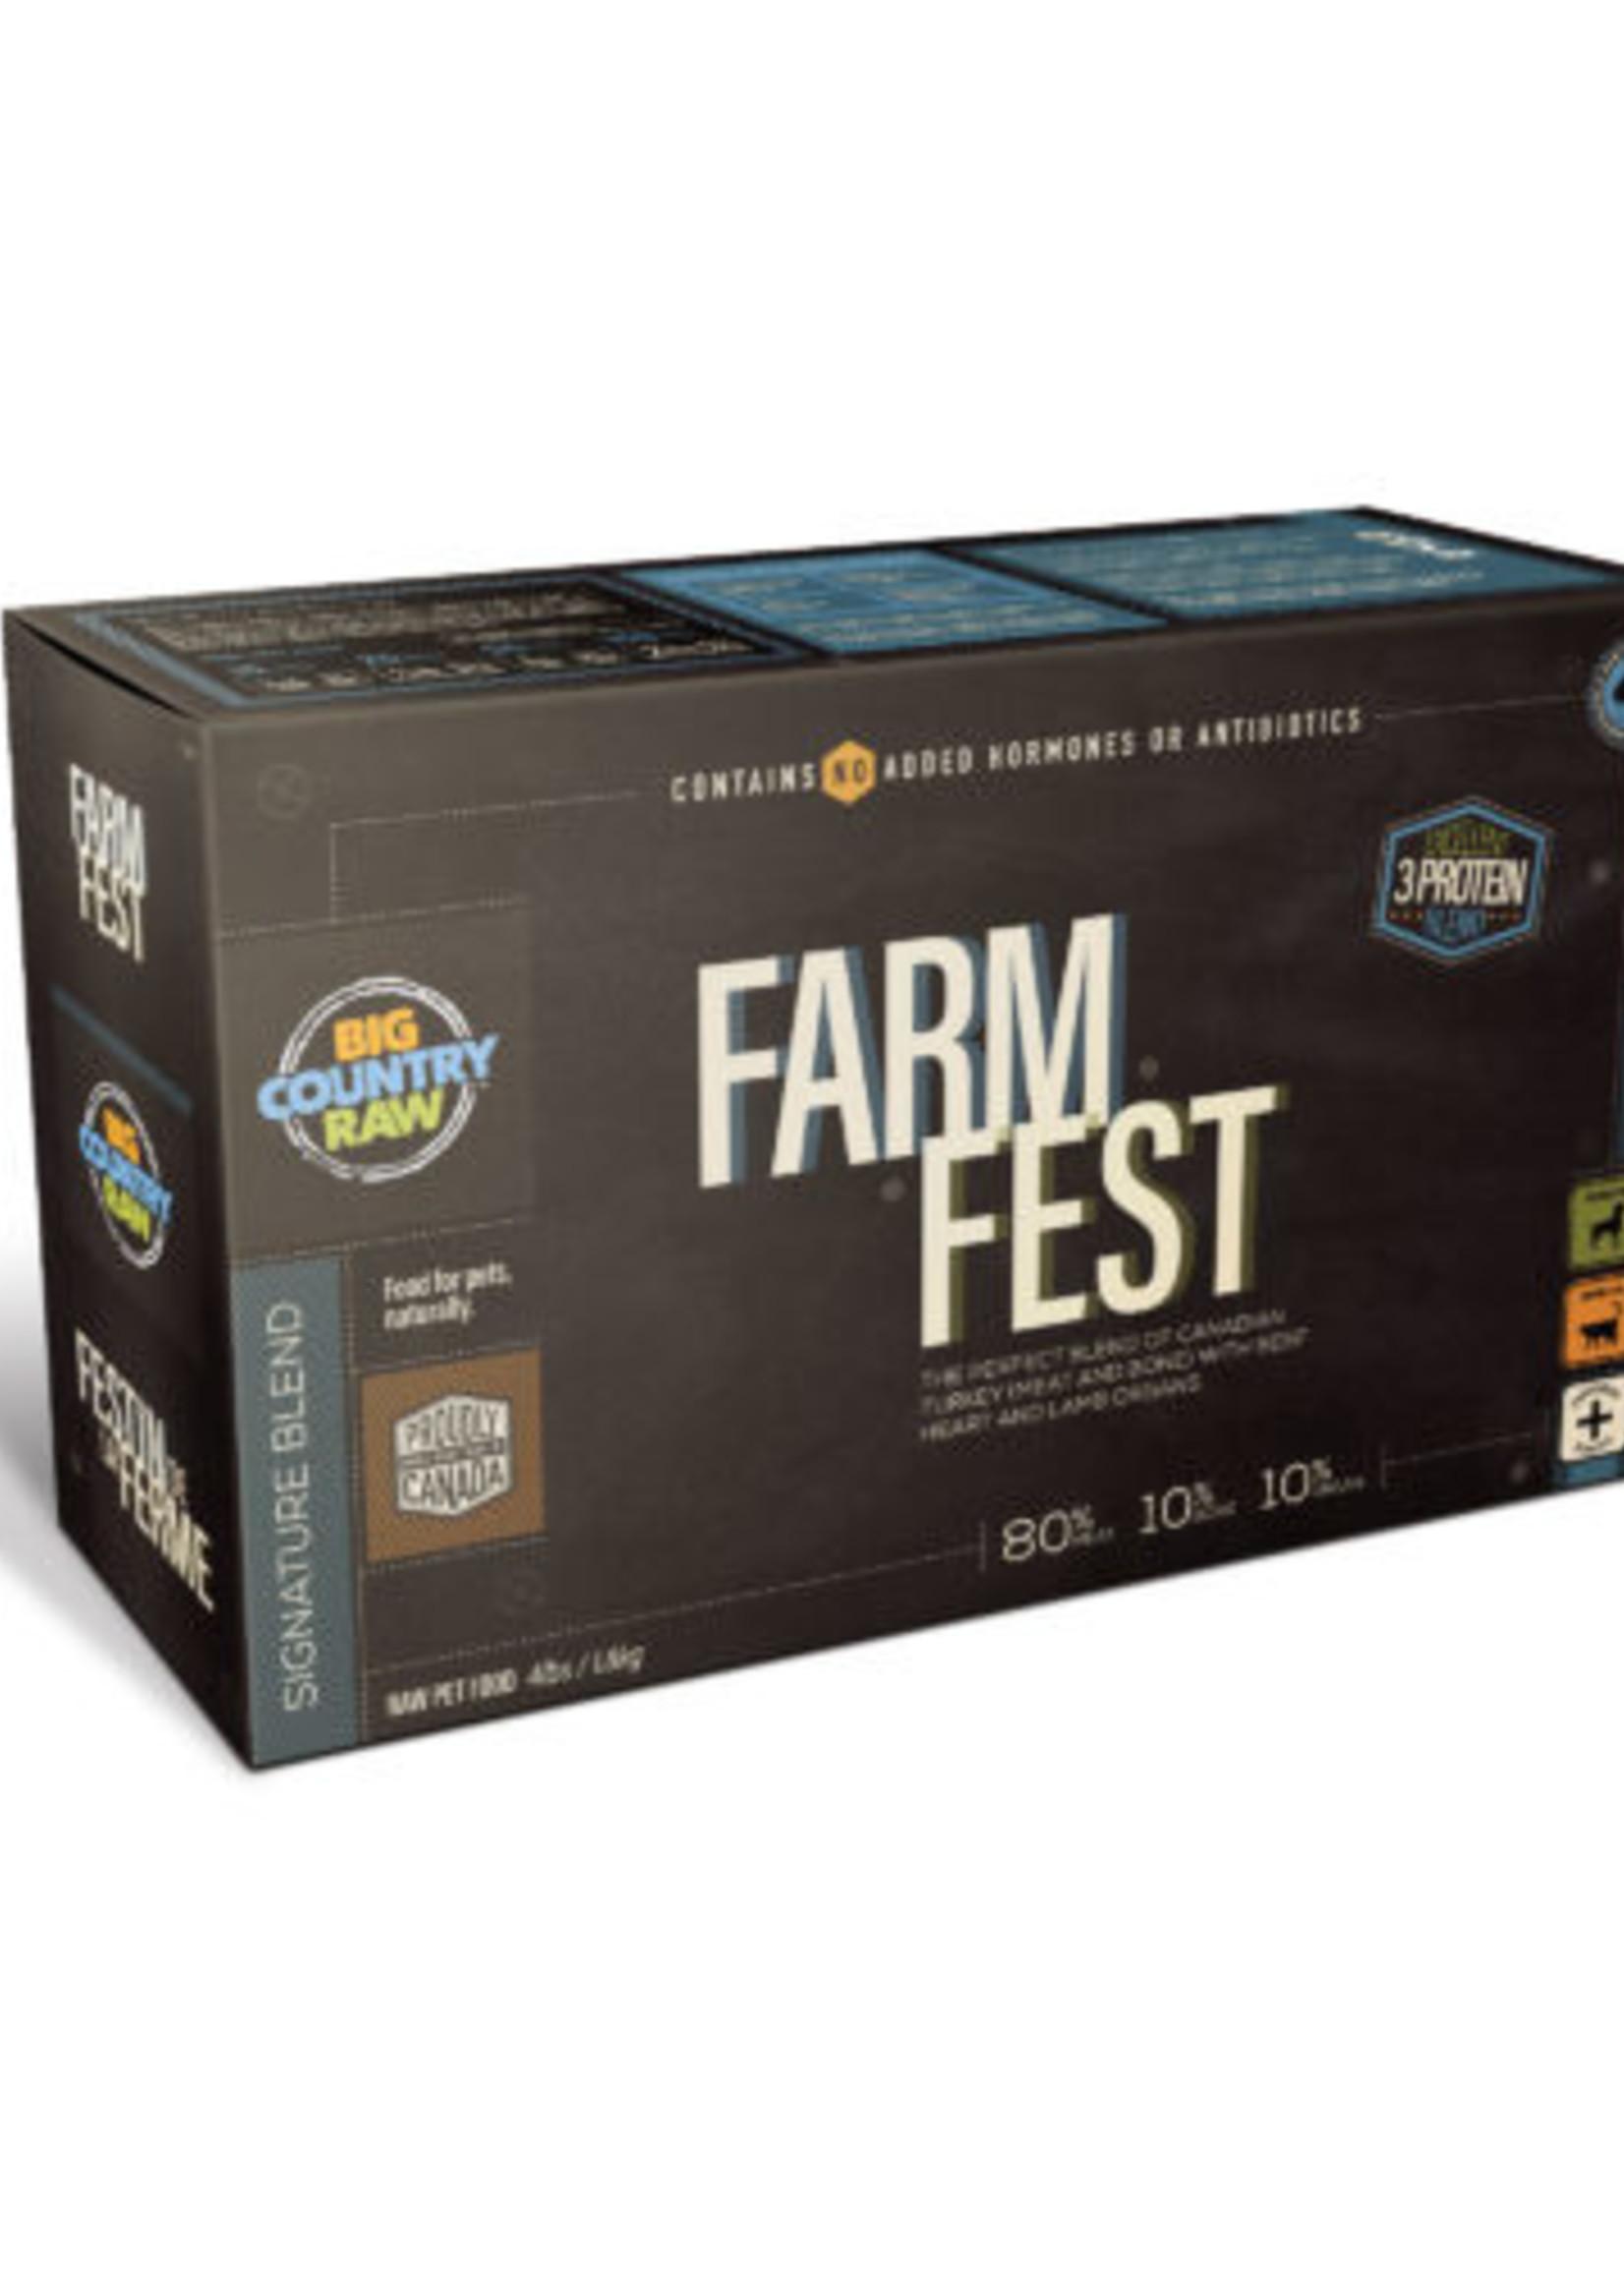 Big Country Raw Big Country Raw Farm Fest Blend Carton 4lbs